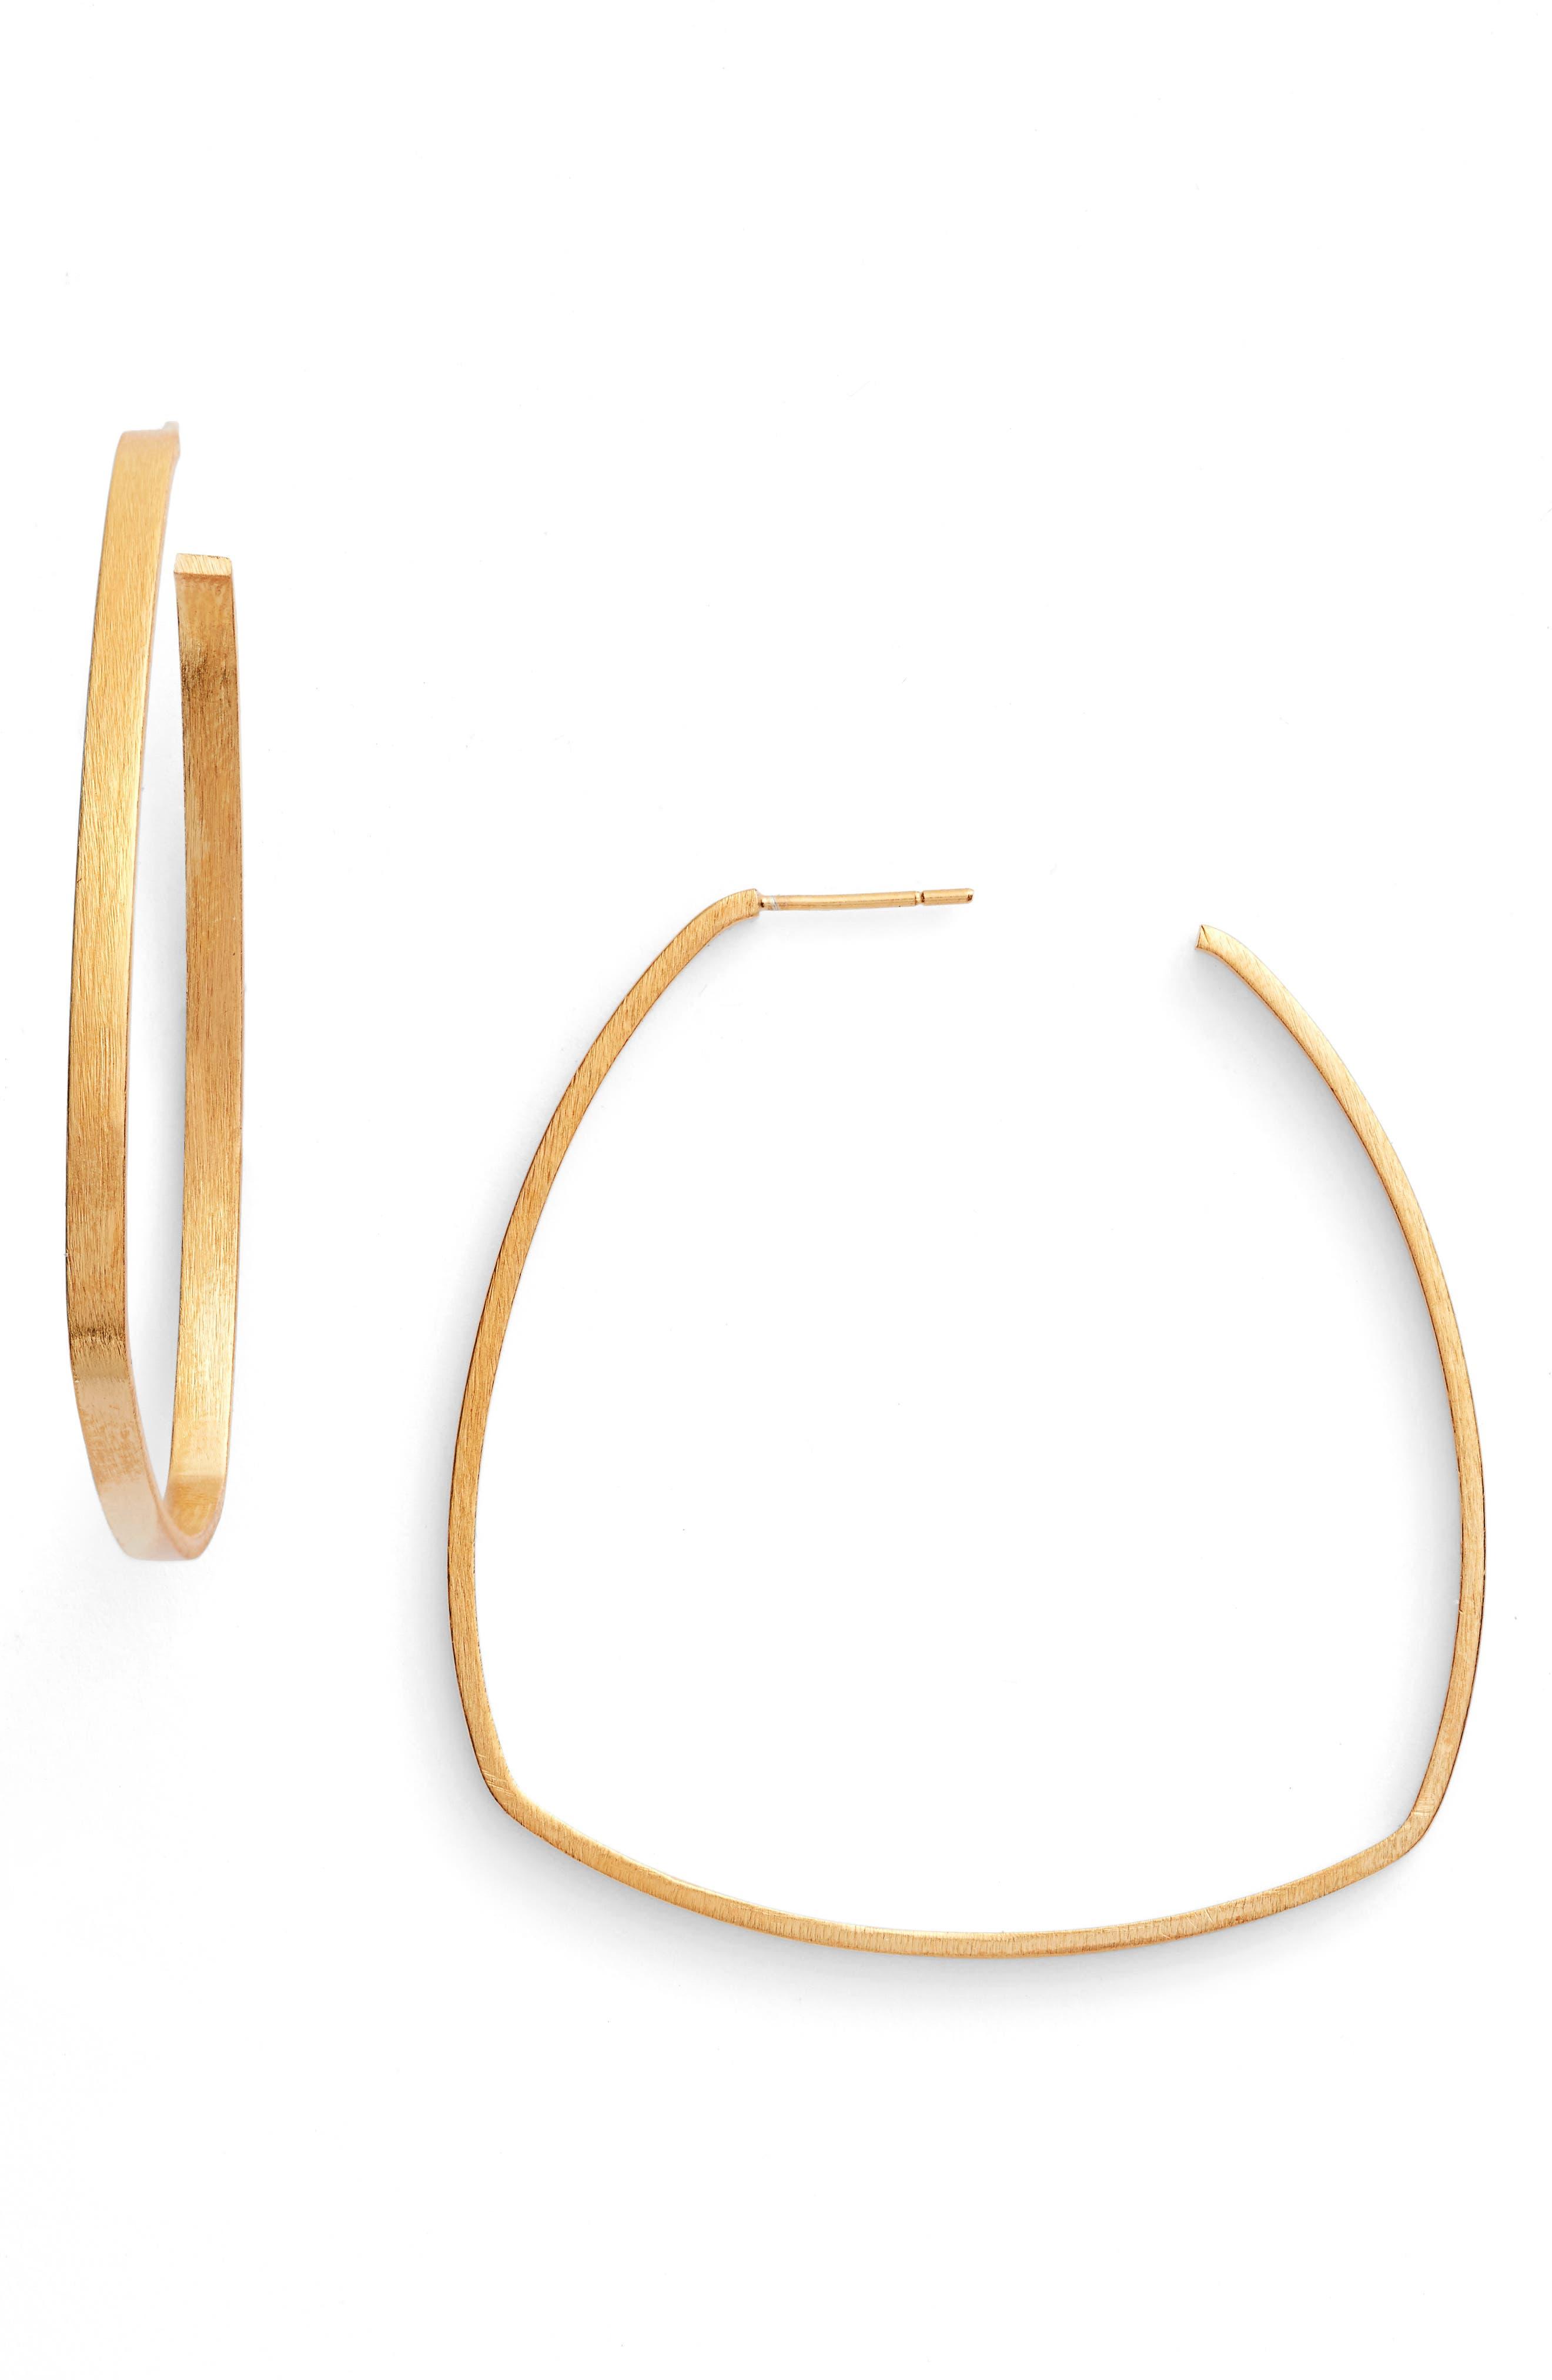 Square Hoop Earrings,                         Main,                         color, Gold